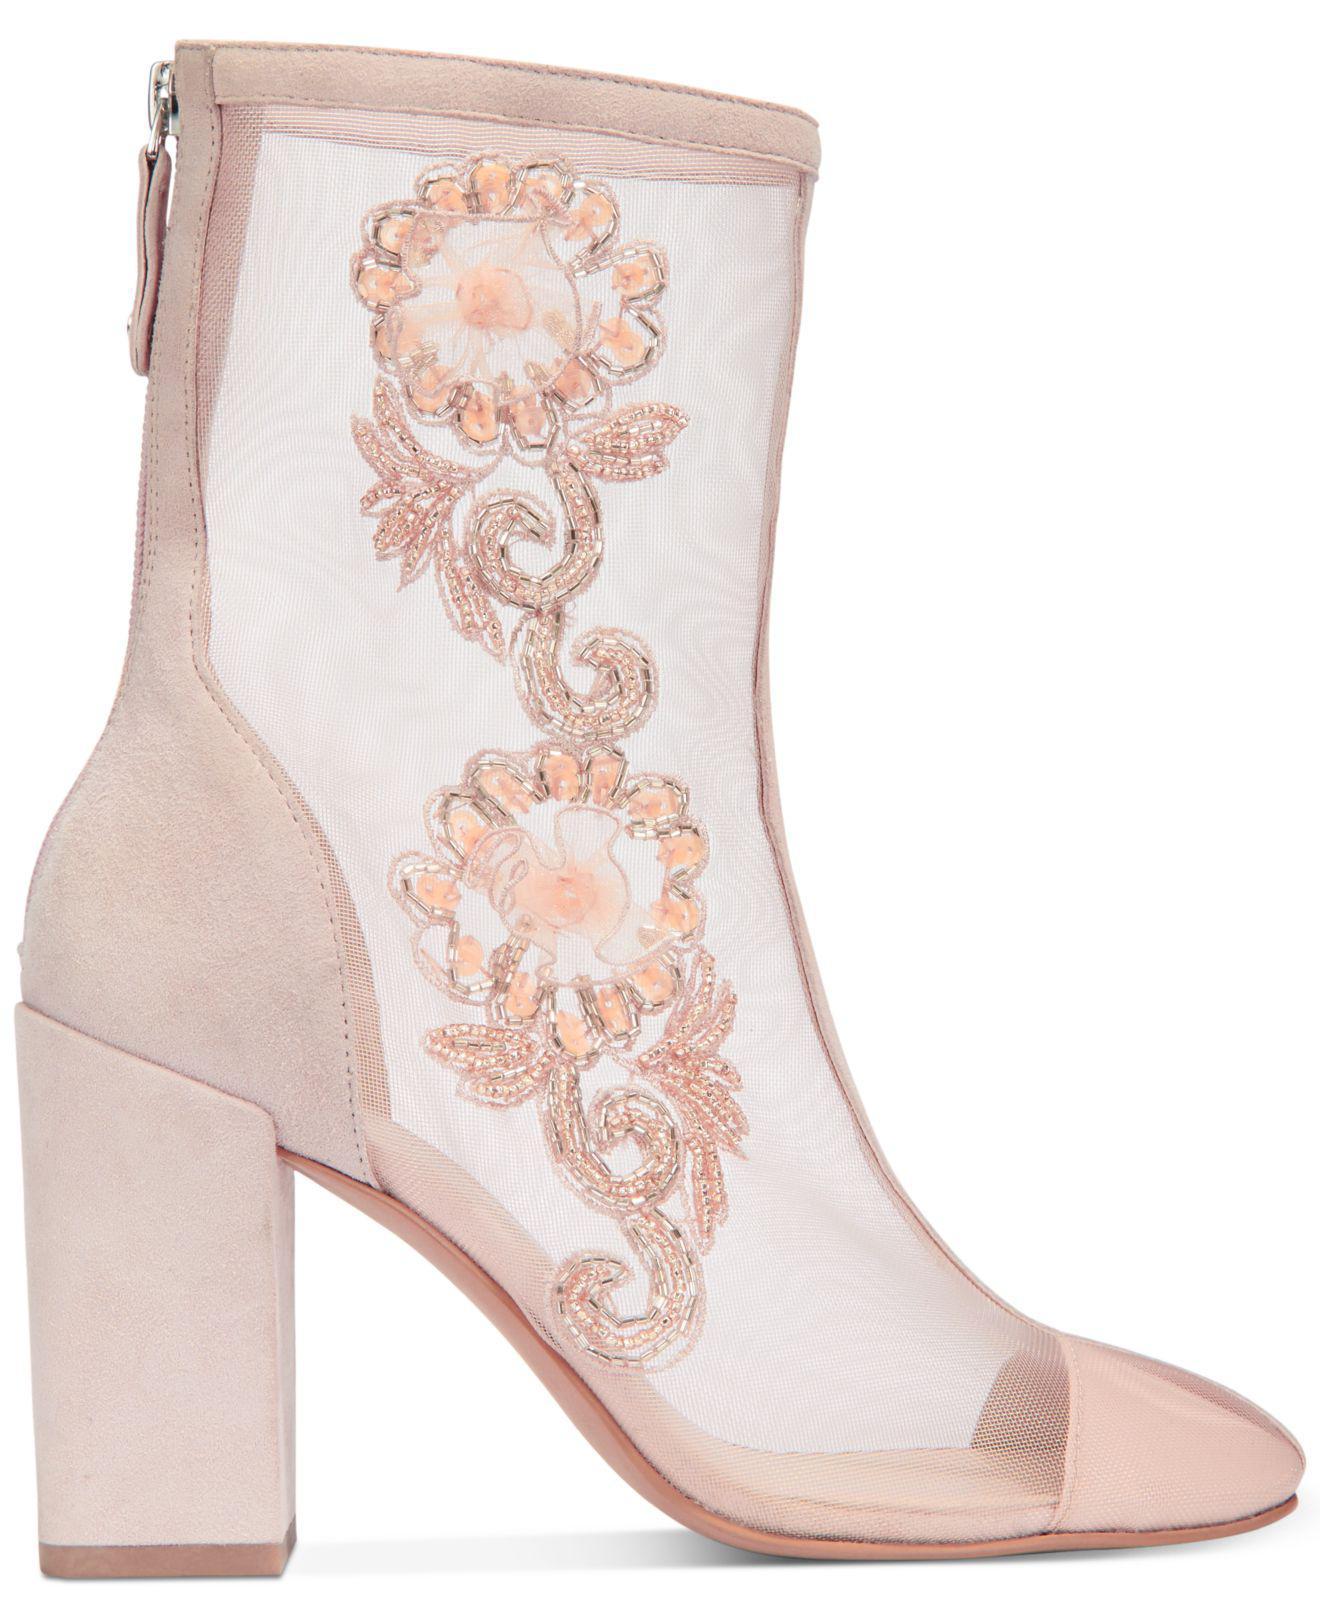 Avec Les Filles reagan Womens Boots pink mesh kid suede 10  US   8 UK